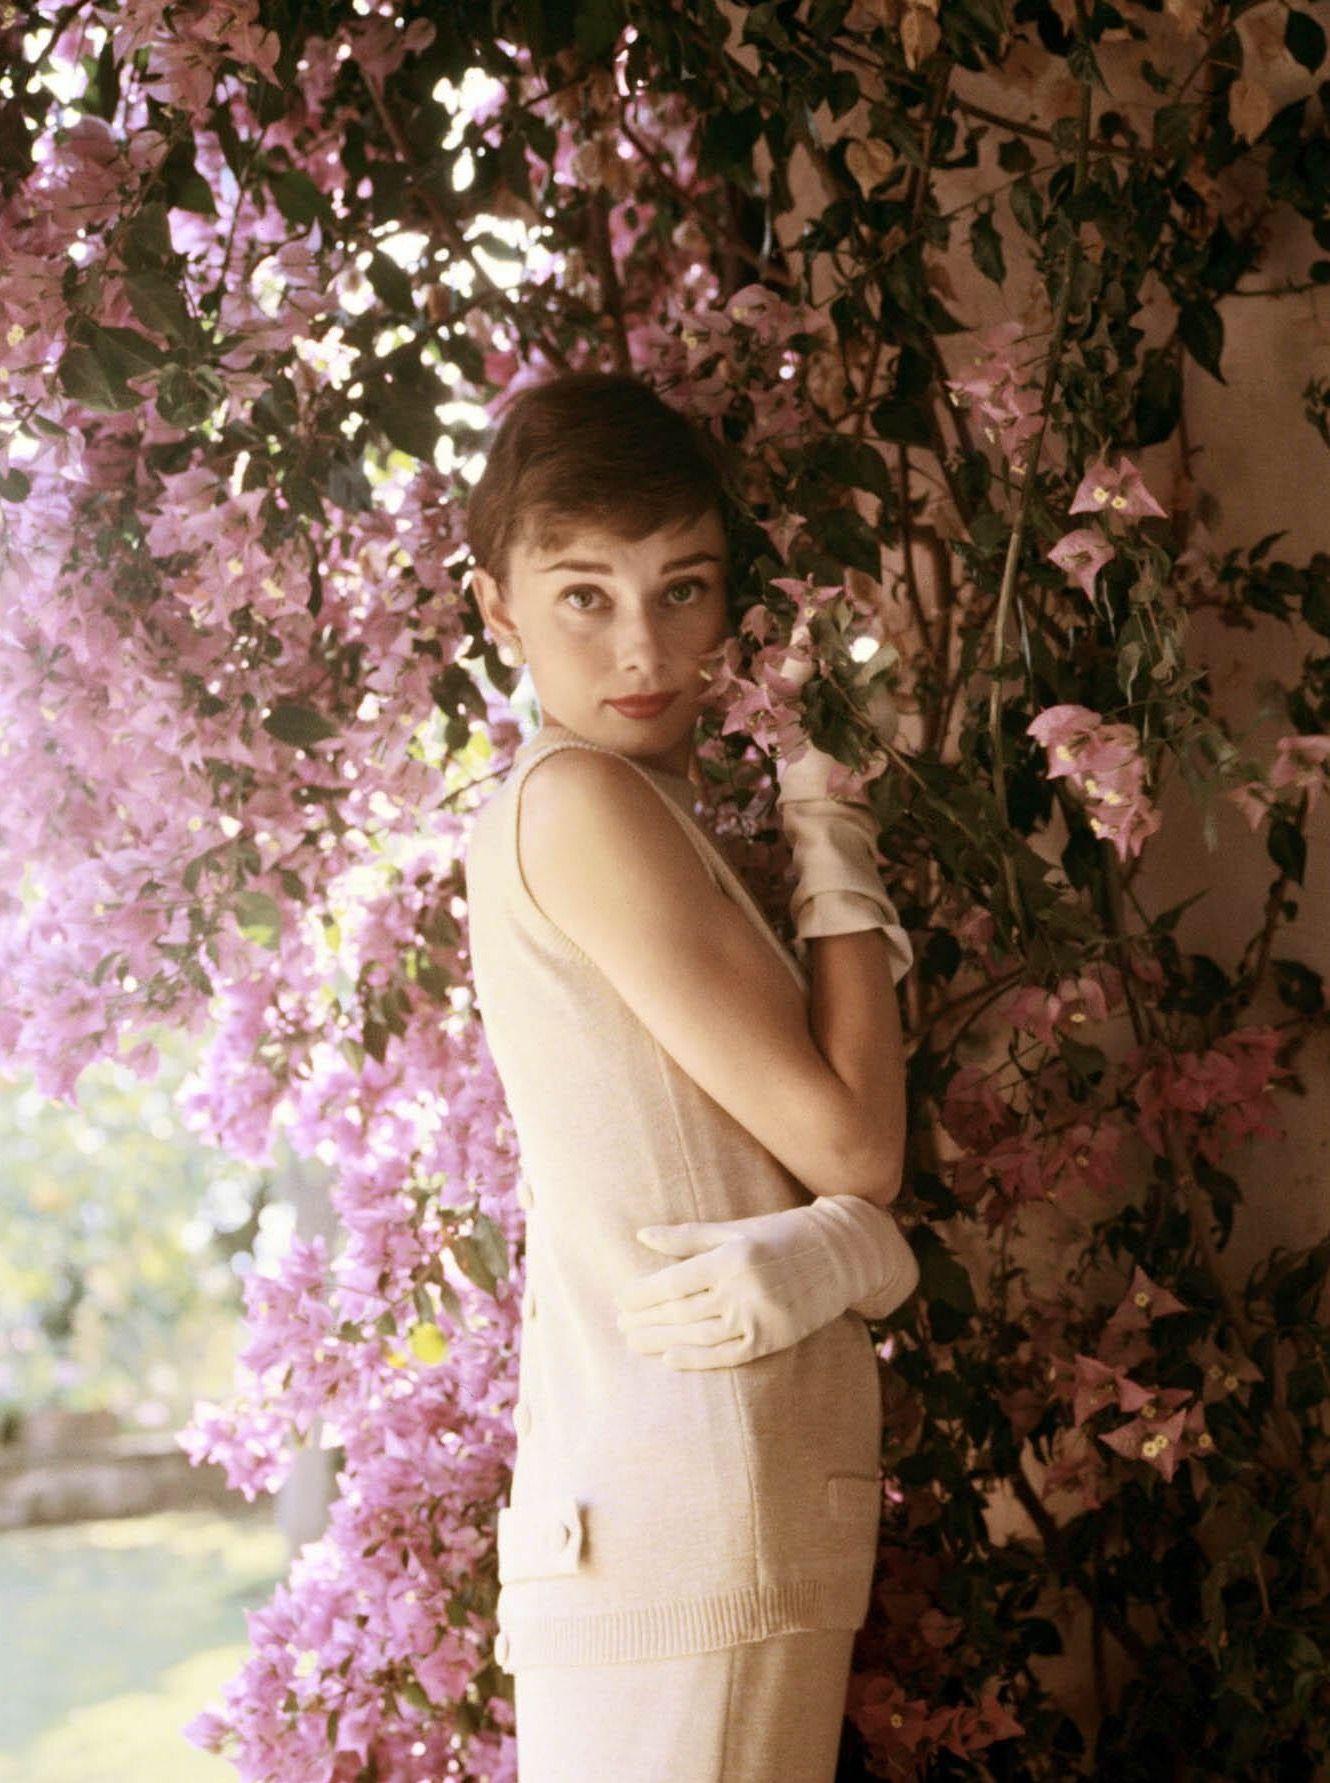 61X91.5cm Audrey Hepburn Pretty in Pink Art Poster Print 24X36